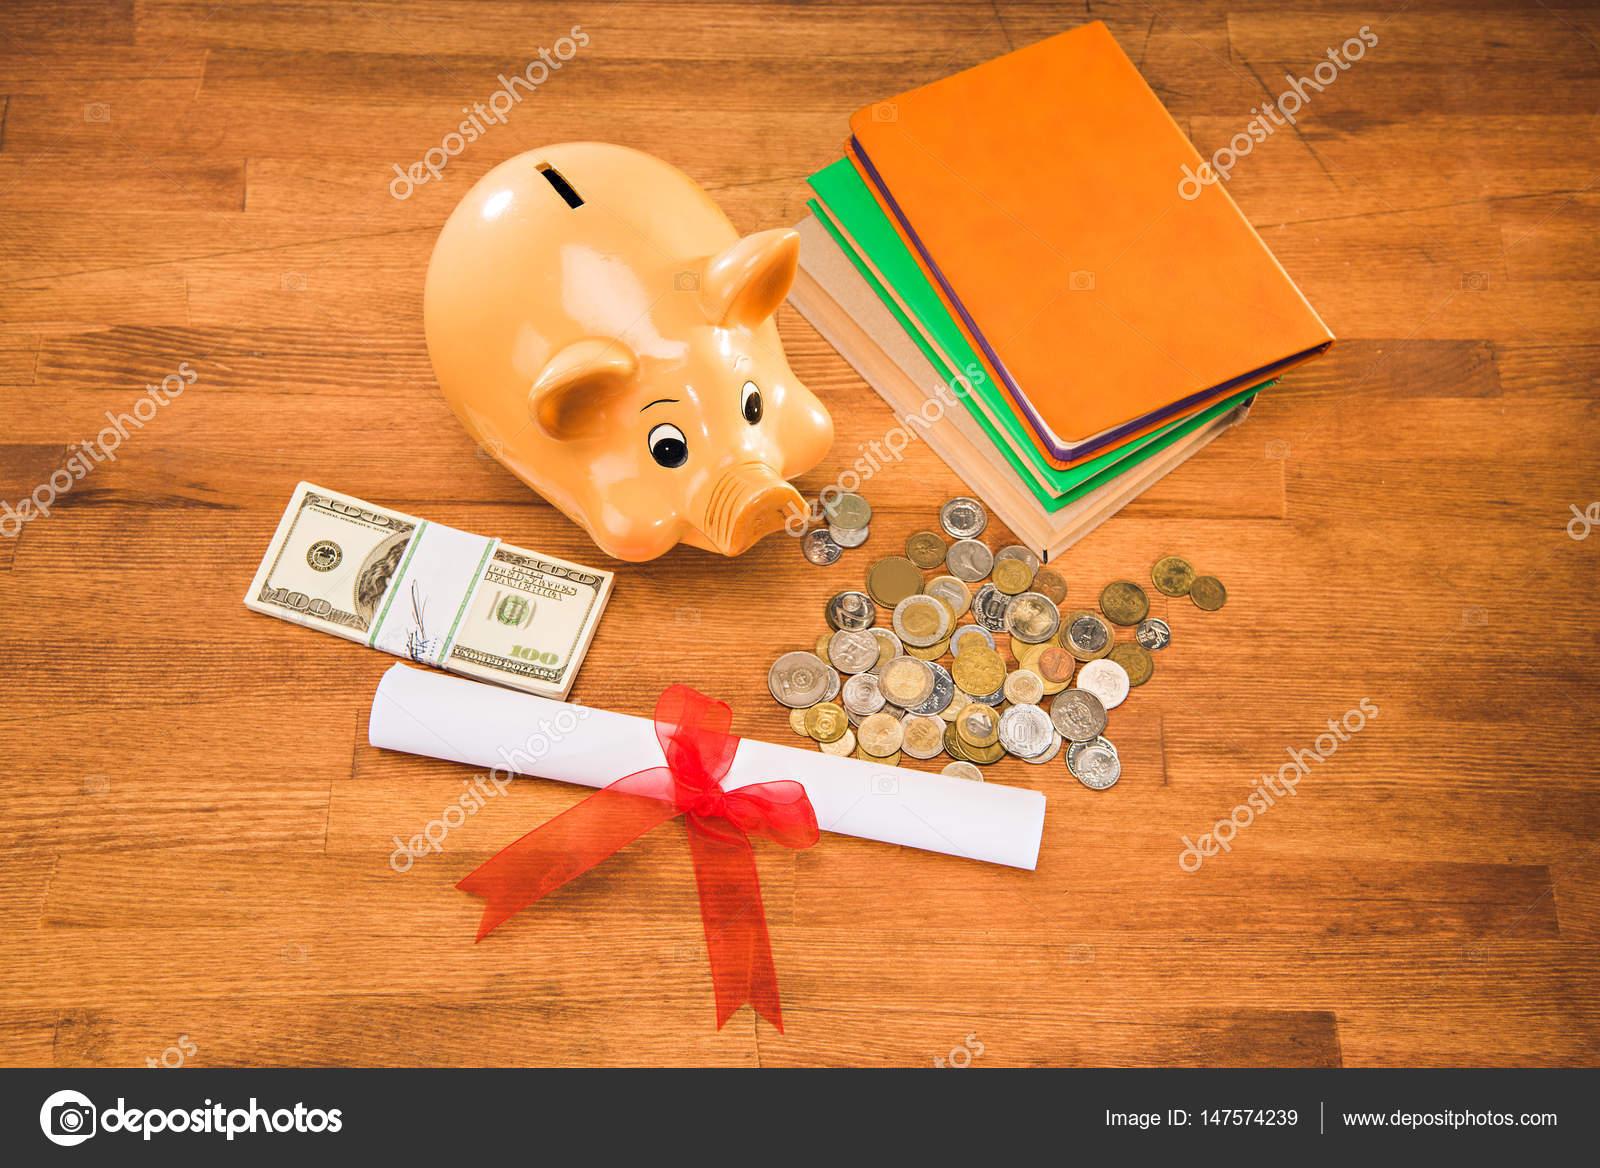 diploma and piggy bank stock photo © sergpoznanskiy  diploma and piggy bank stock photo 147574239